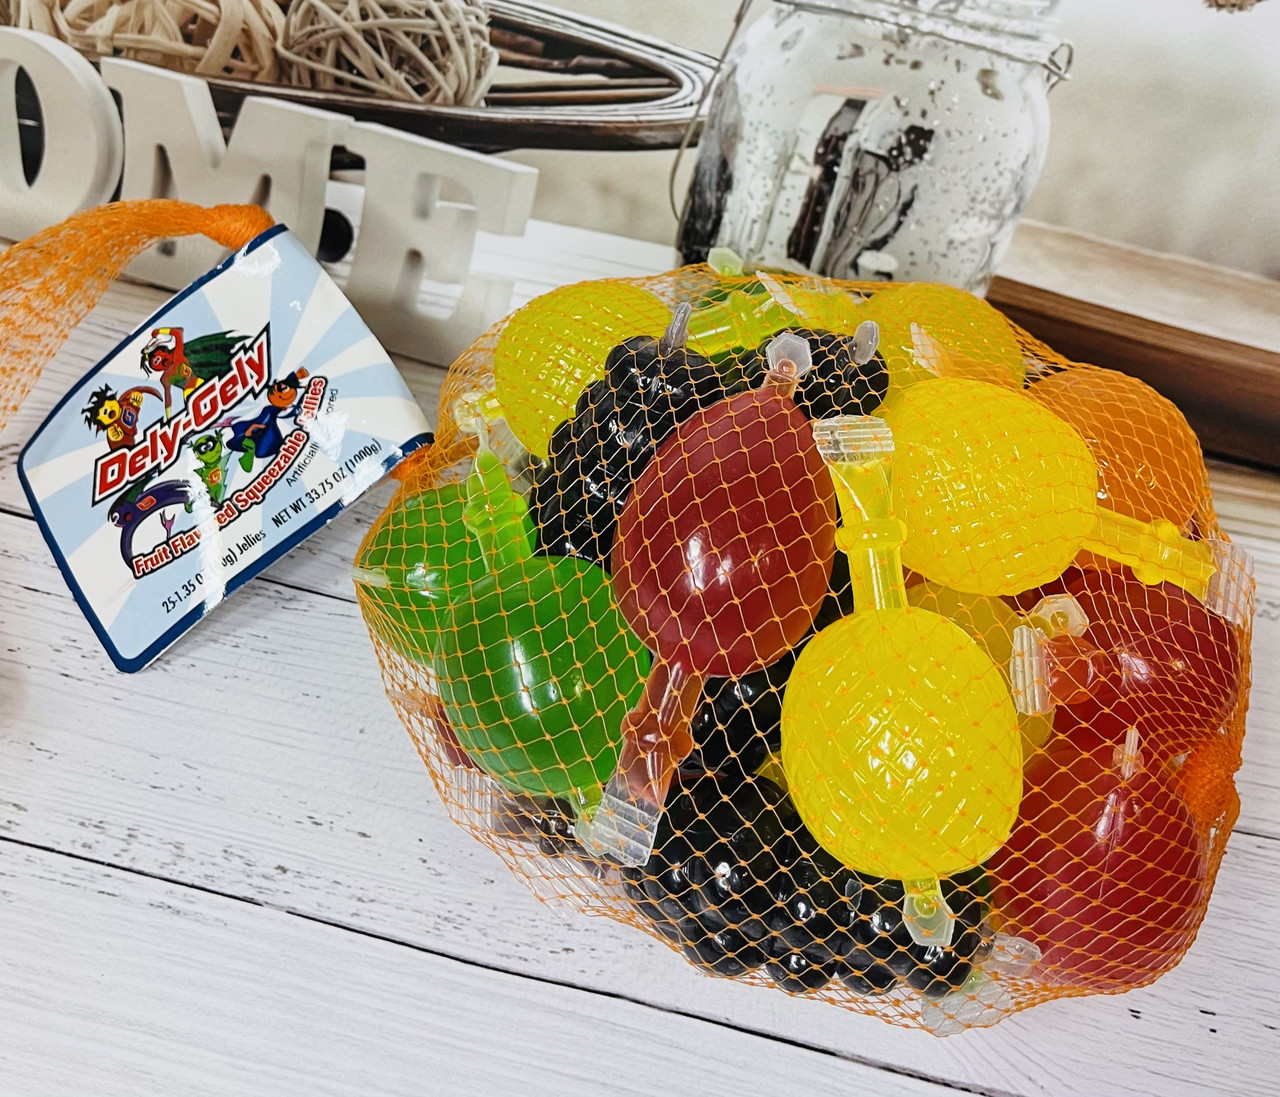 Желейні фруктові цукерки Fruit Jelly Candy з Tik Tok Тік Ток, 25шт